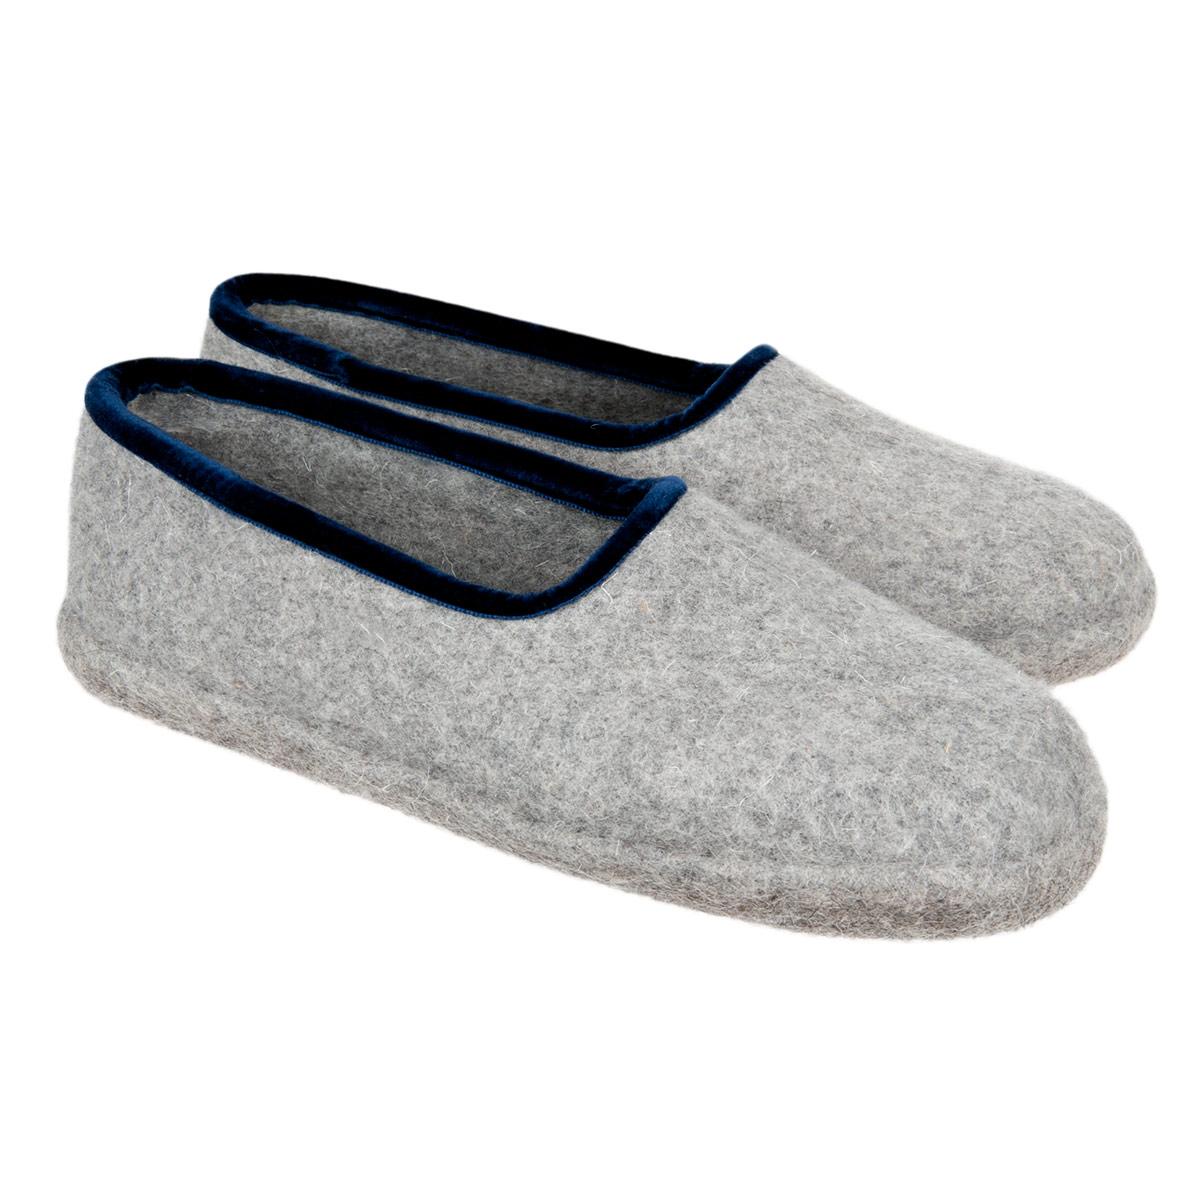 pantofole in lana di ottima qualità 53d0aeb4dadf